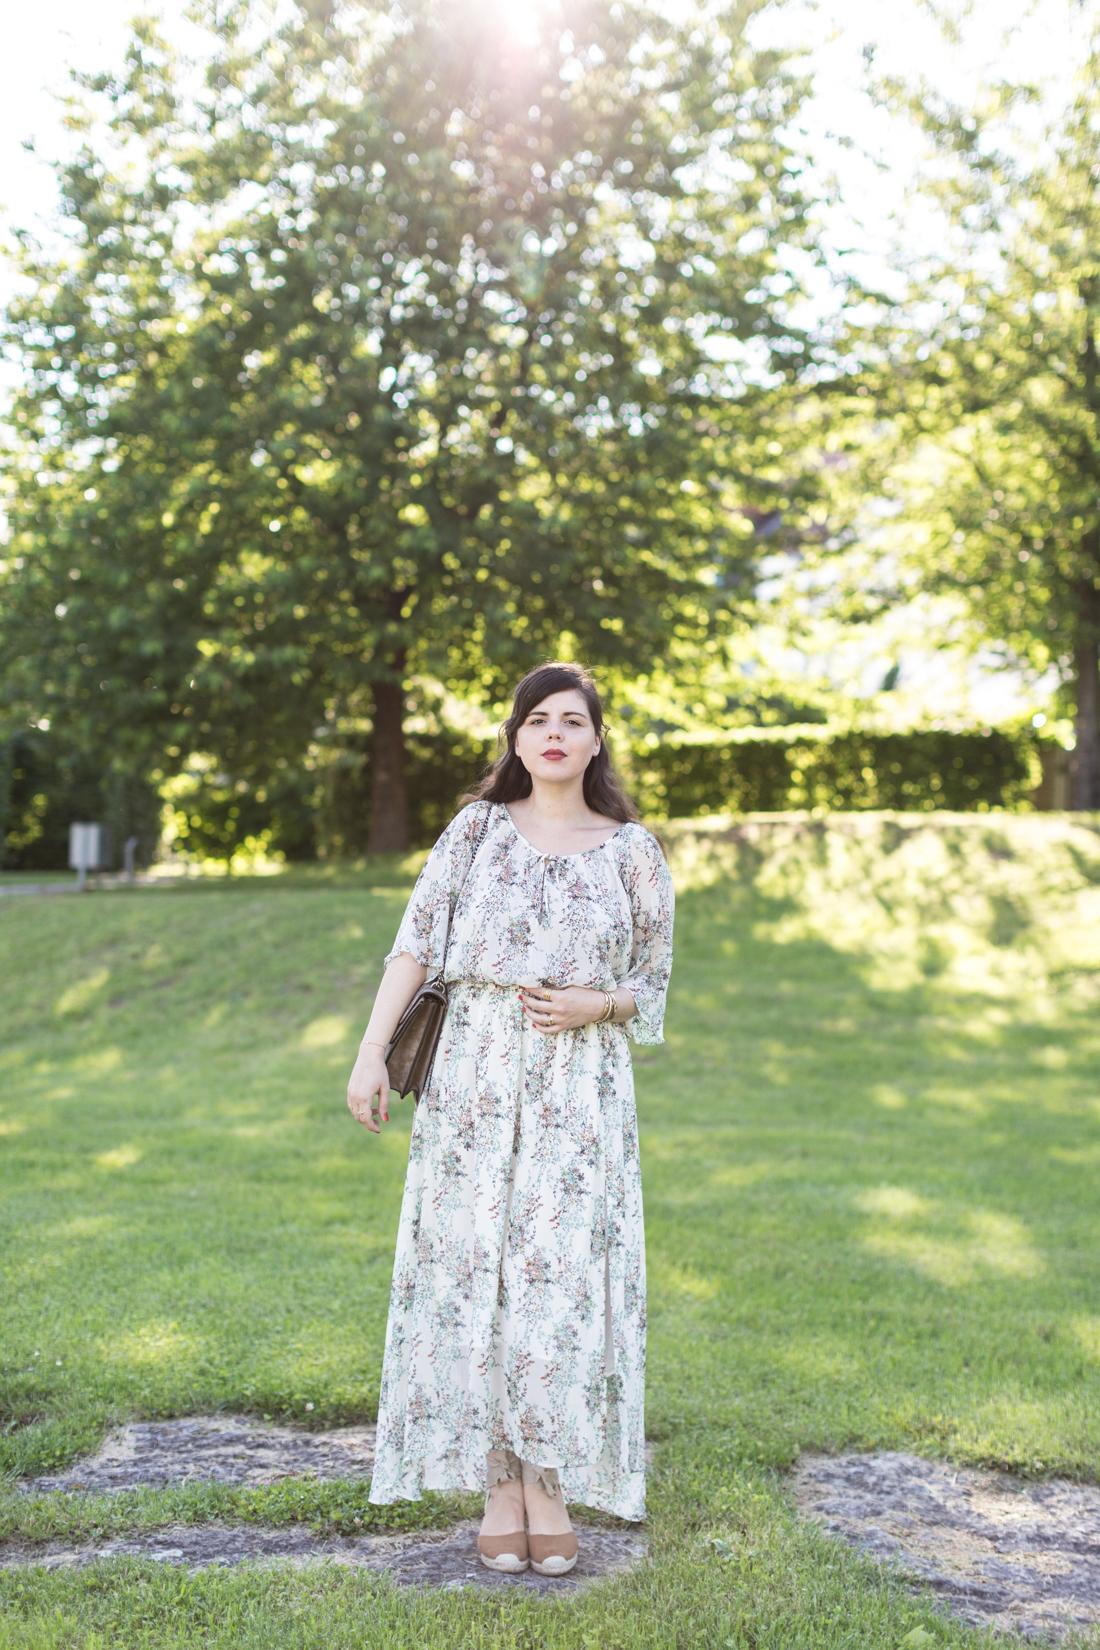 1100 robe ikks sac gucci dionysus espadrilles sezane - copyright Pauline paulinefashionblog.com-1